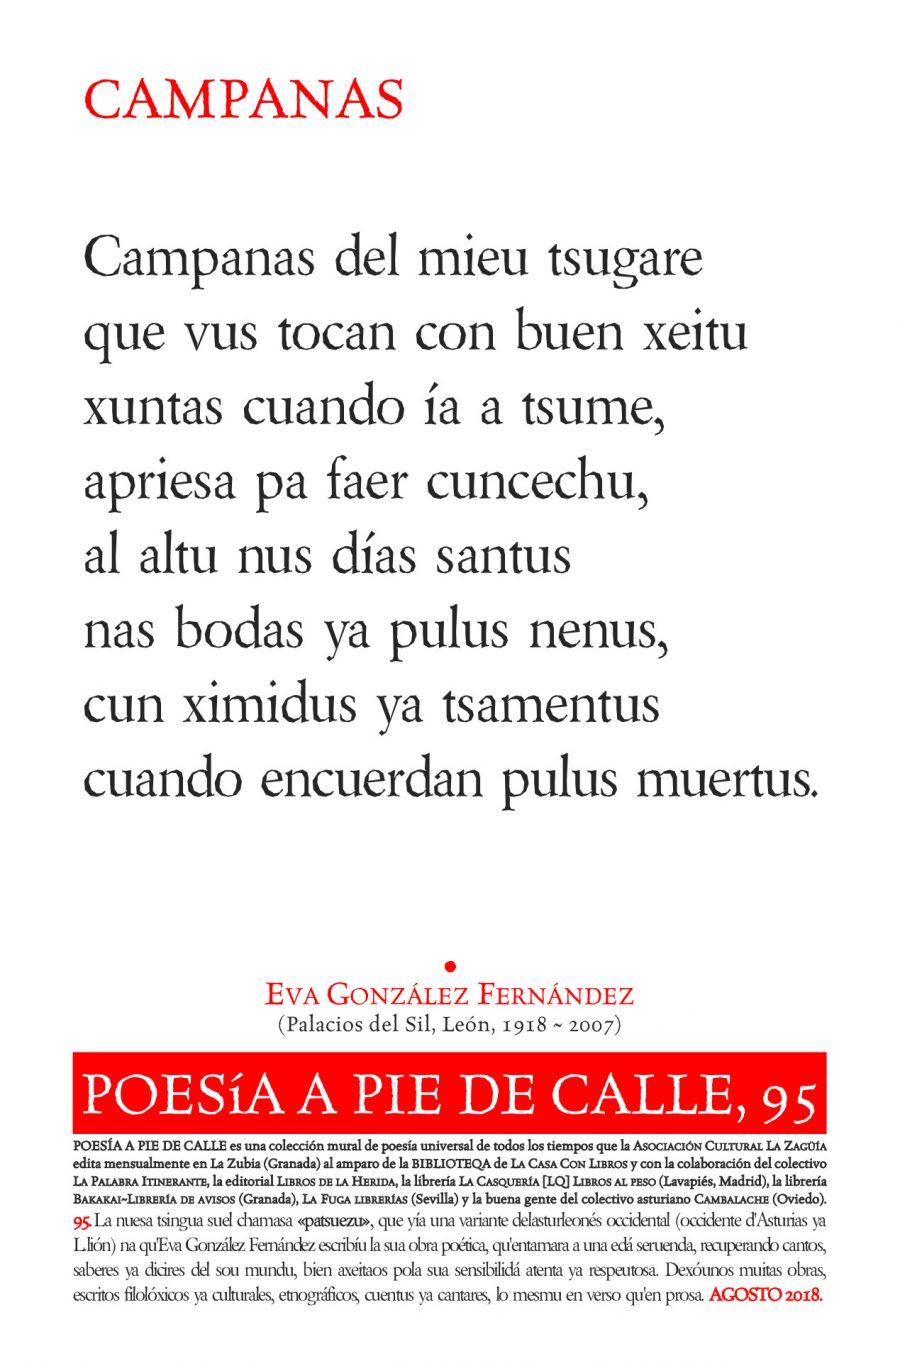 POESÍA A PIE DE CALLE, 95: CAMPANAS, DE EVA GONZÁLEZ FERNÁNDEZ